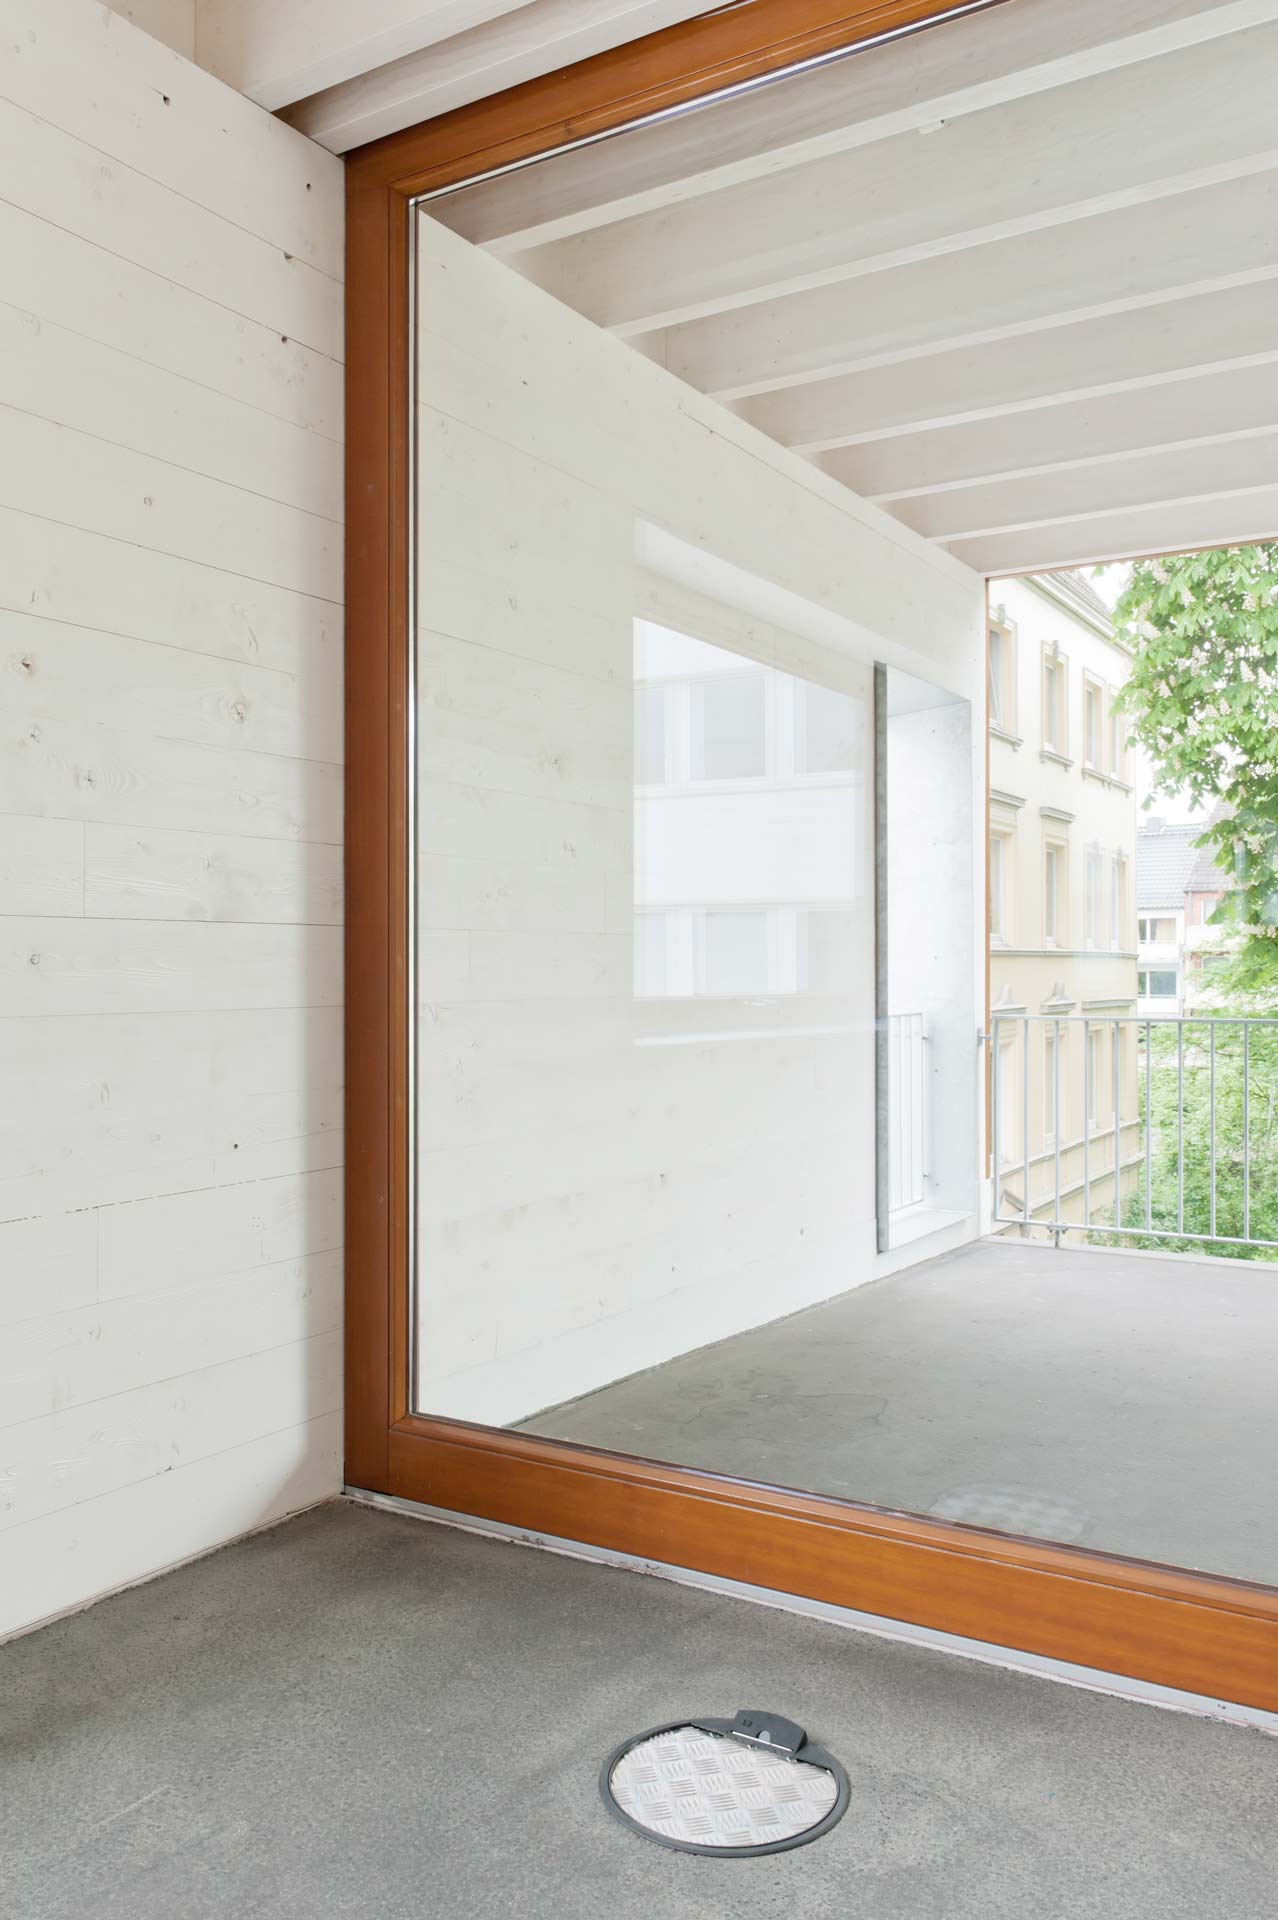 Studio Osterstrasse Limbrock Tubbesing Architekten